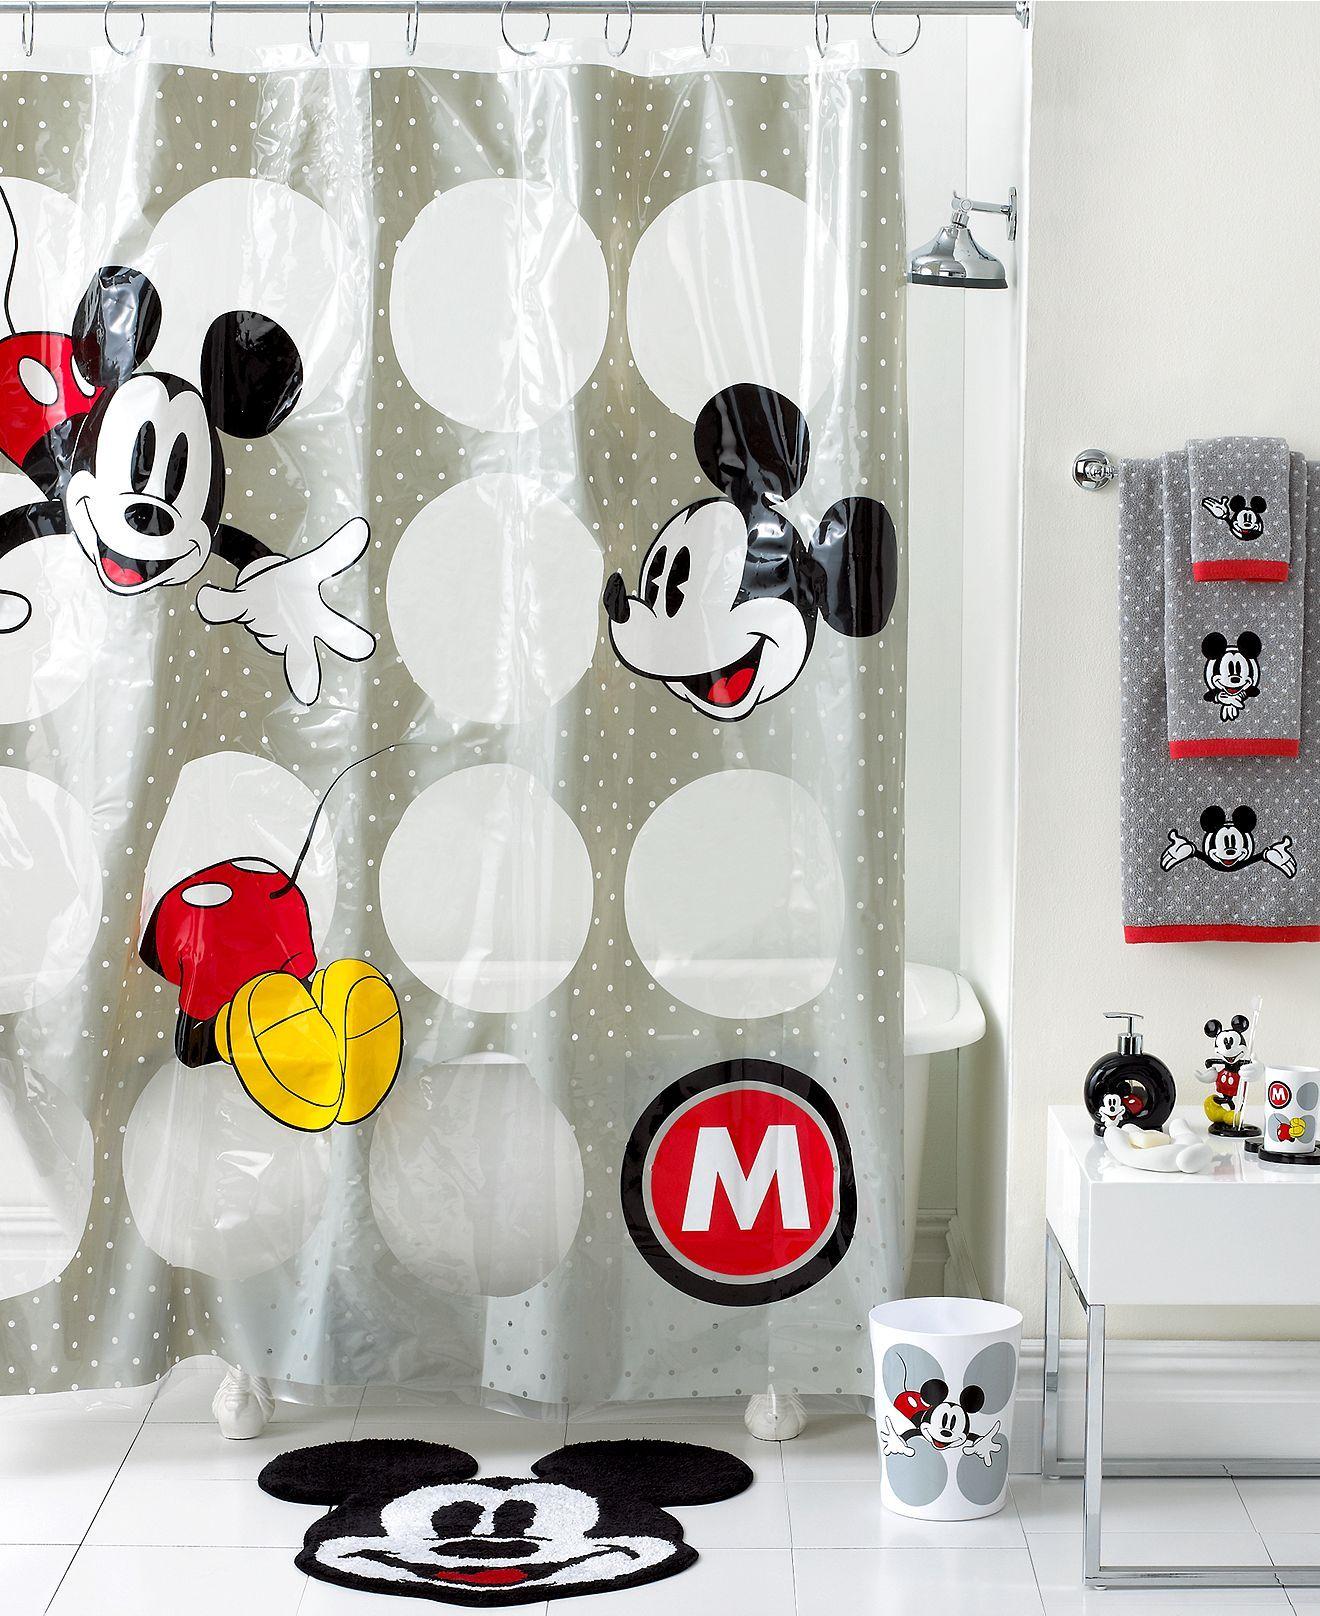 Disney Bath, Disney Mickey Mouse Collection - Bath - Bed & Bath ...